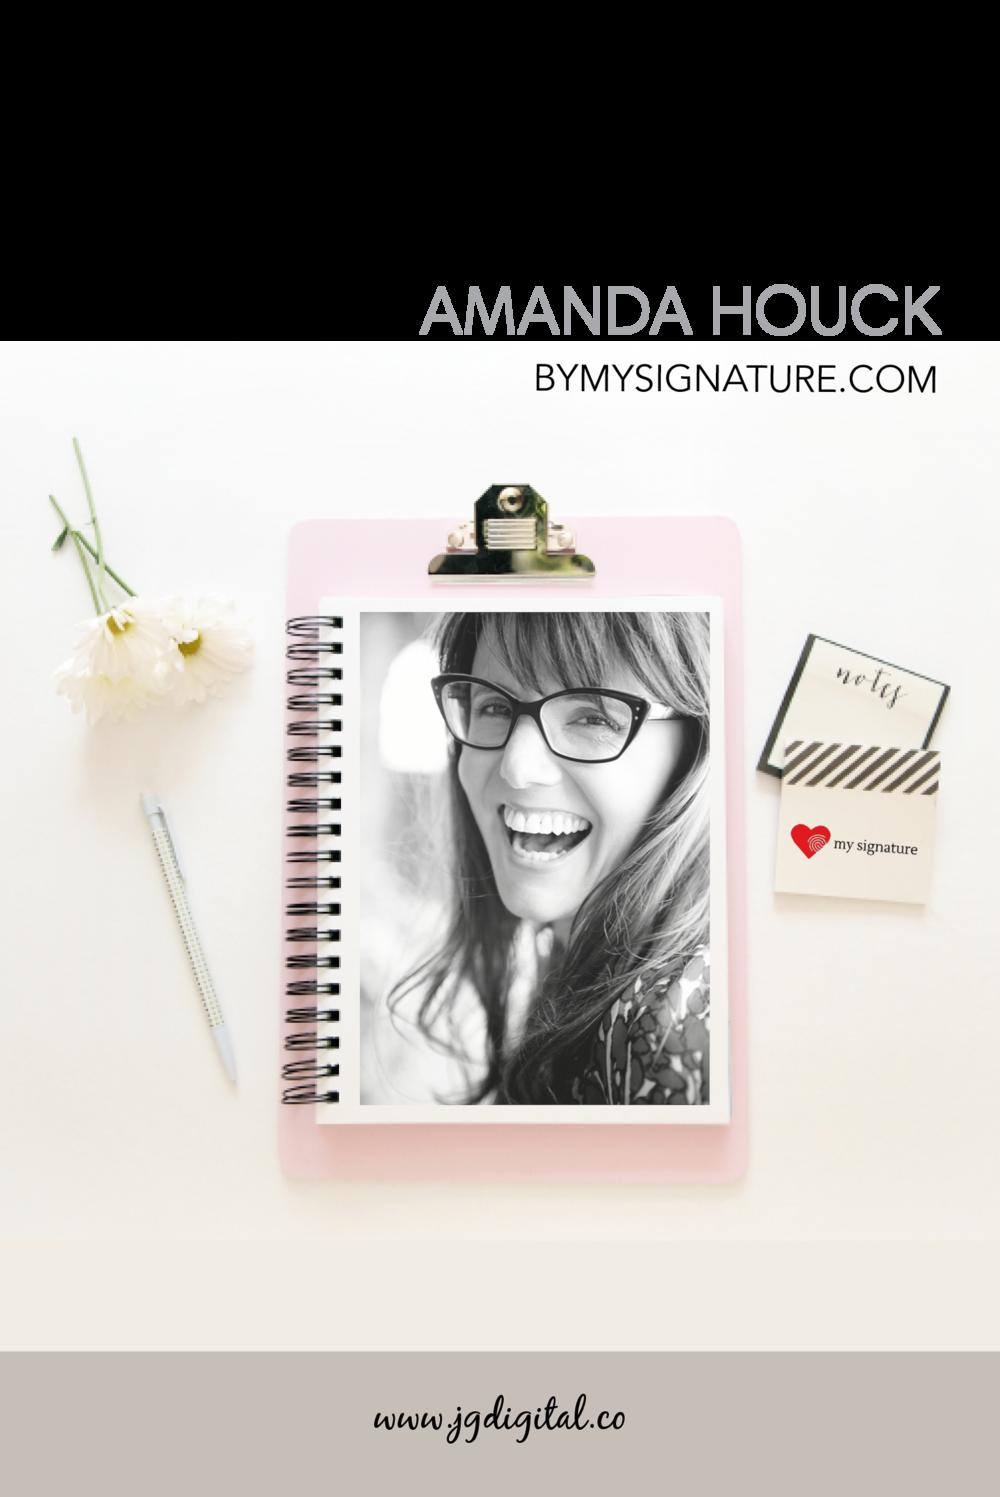 Amanda Houck